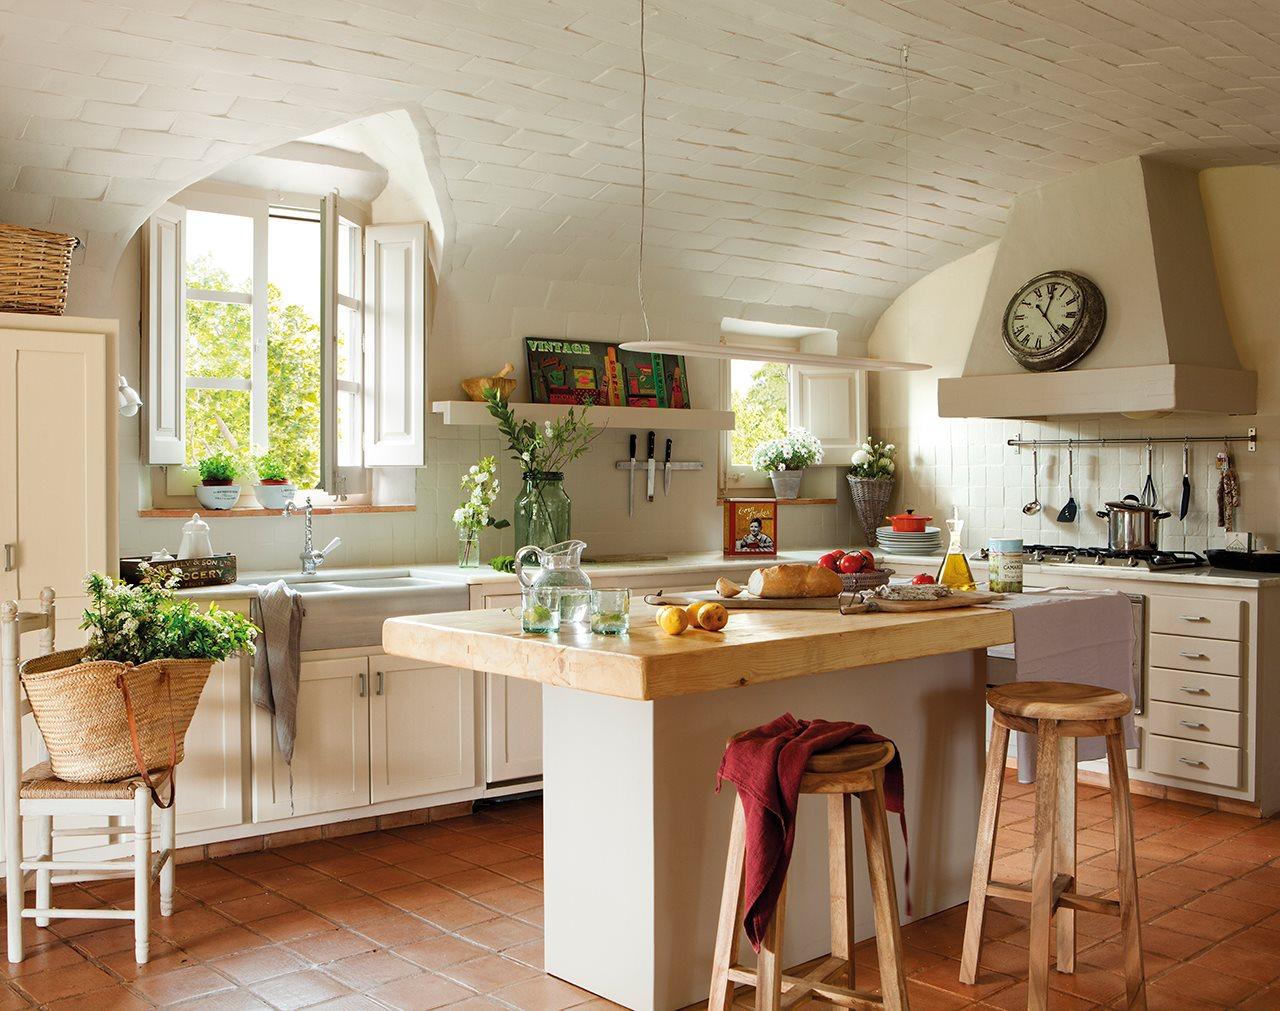 Mas a decorada con estilo vintage - Cocina con alma ...